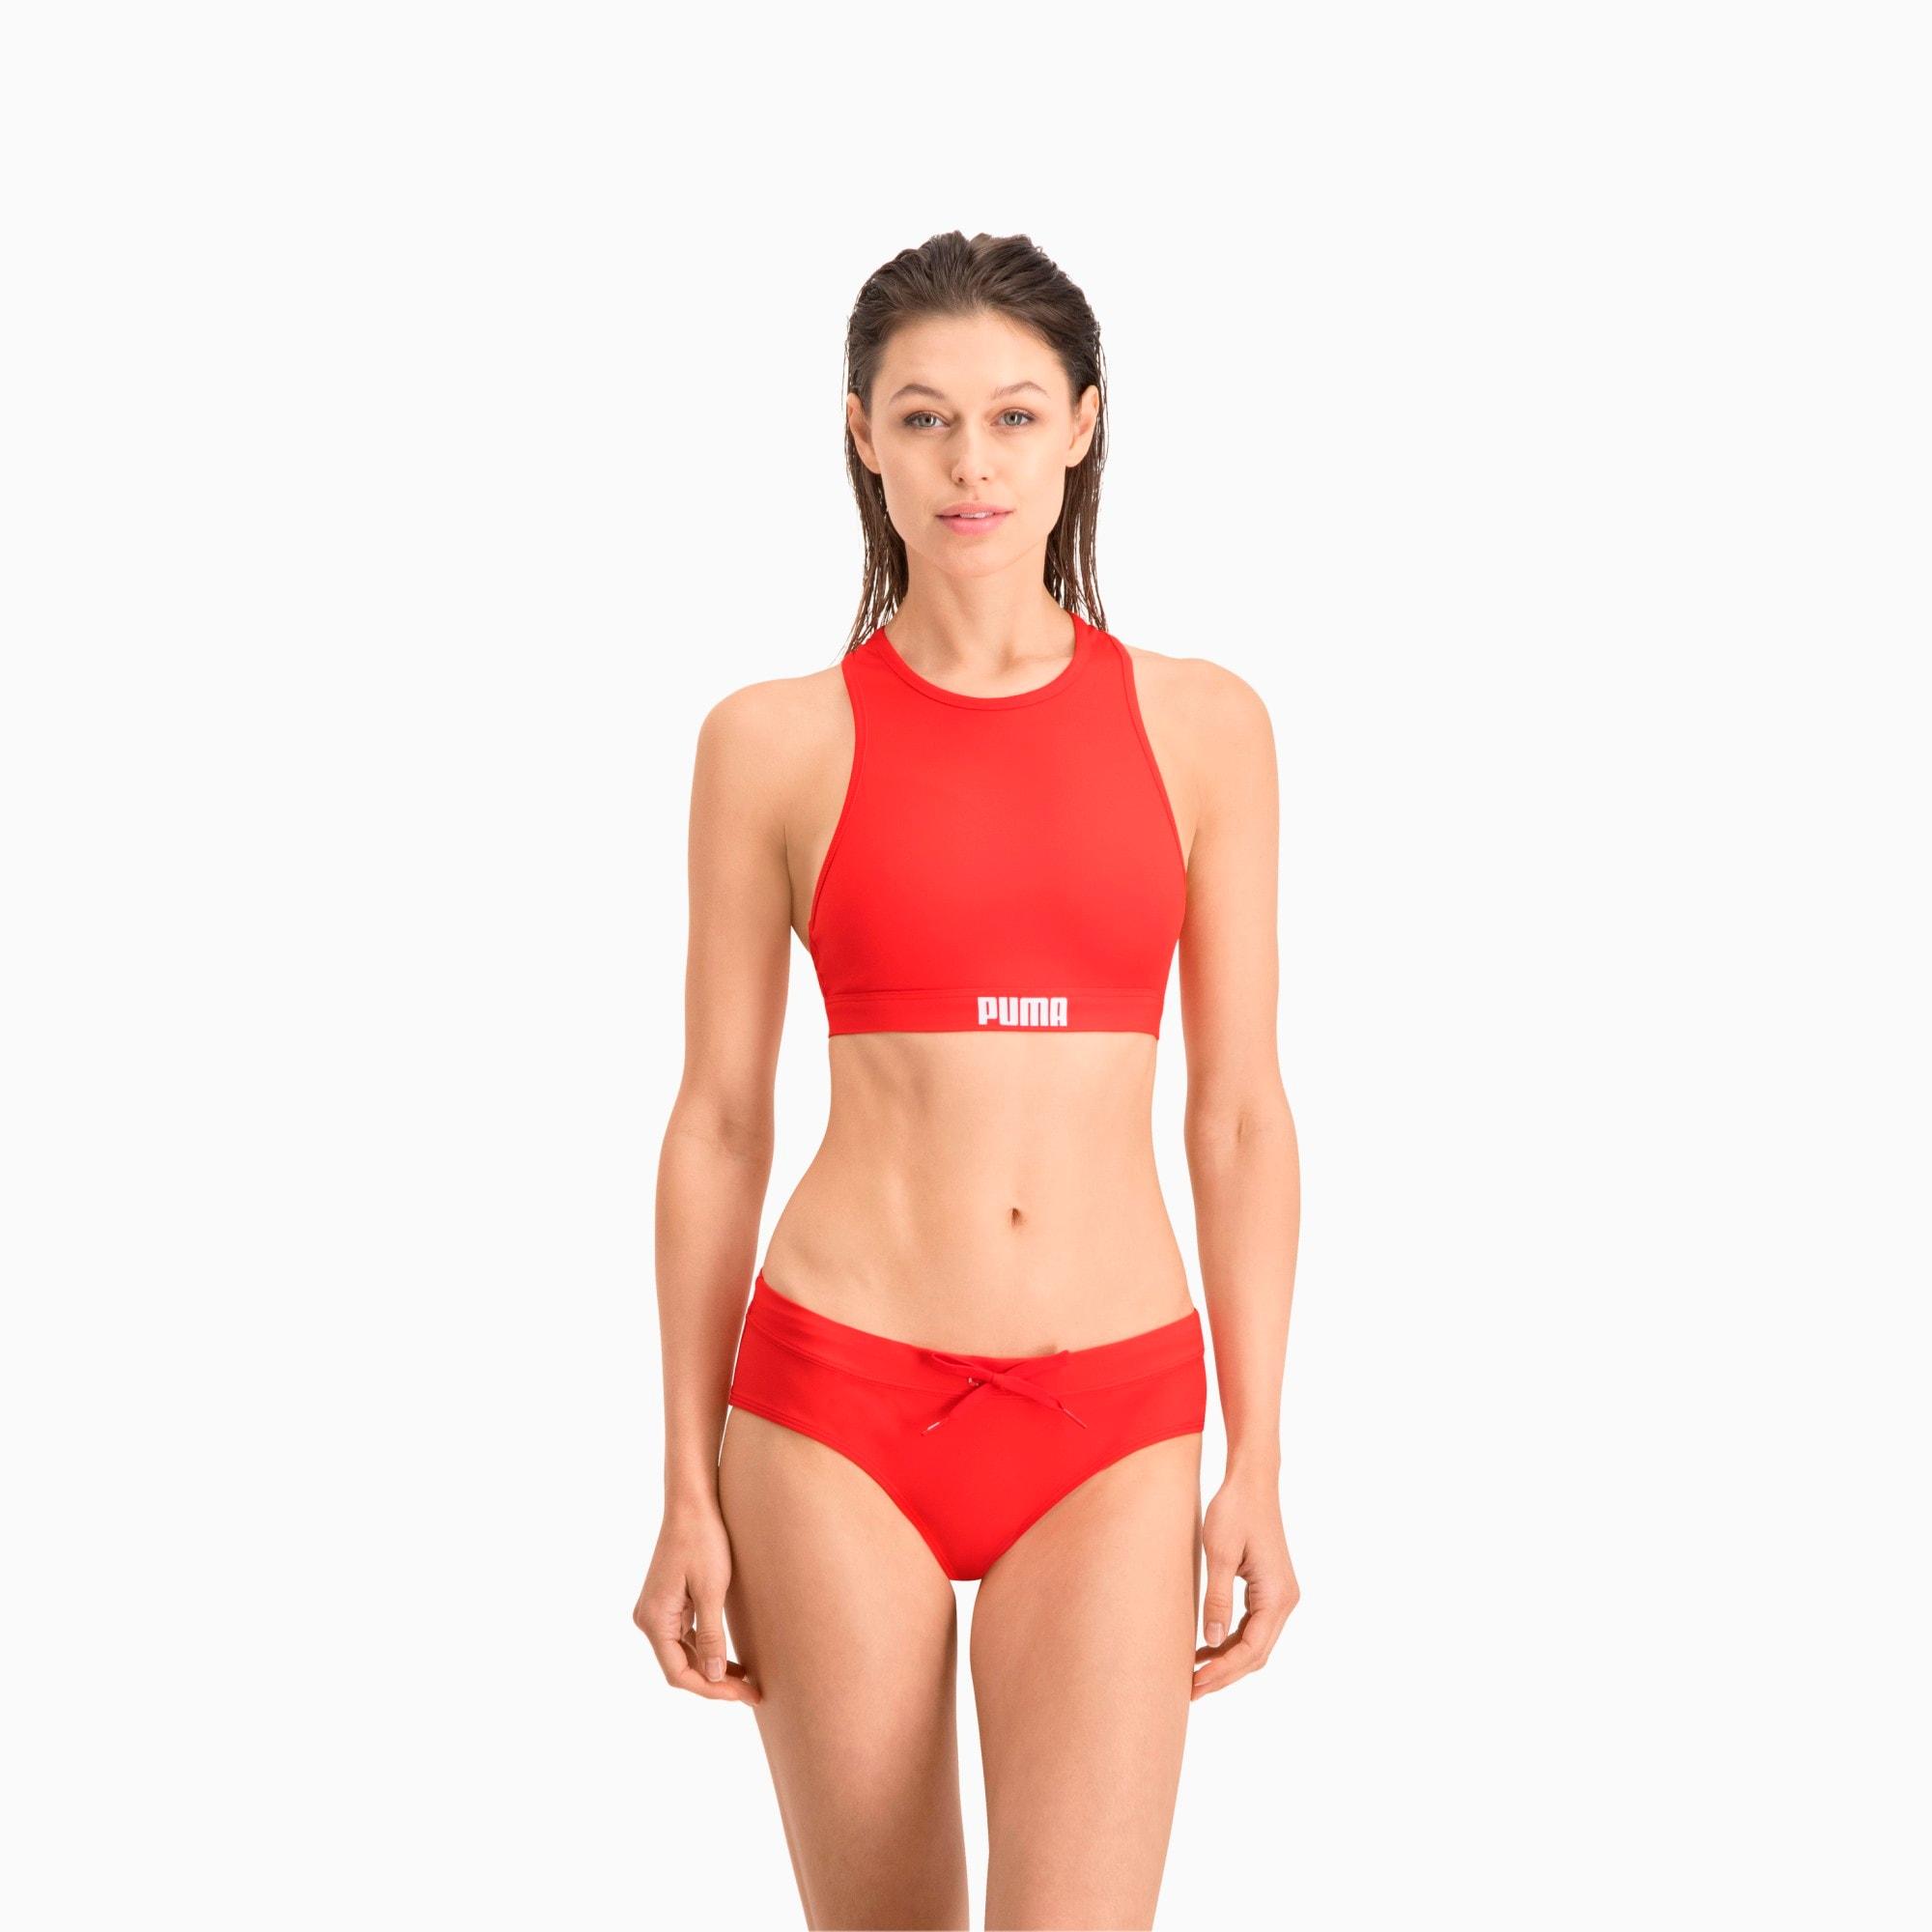 PUMA Swim Women's Racerback Top